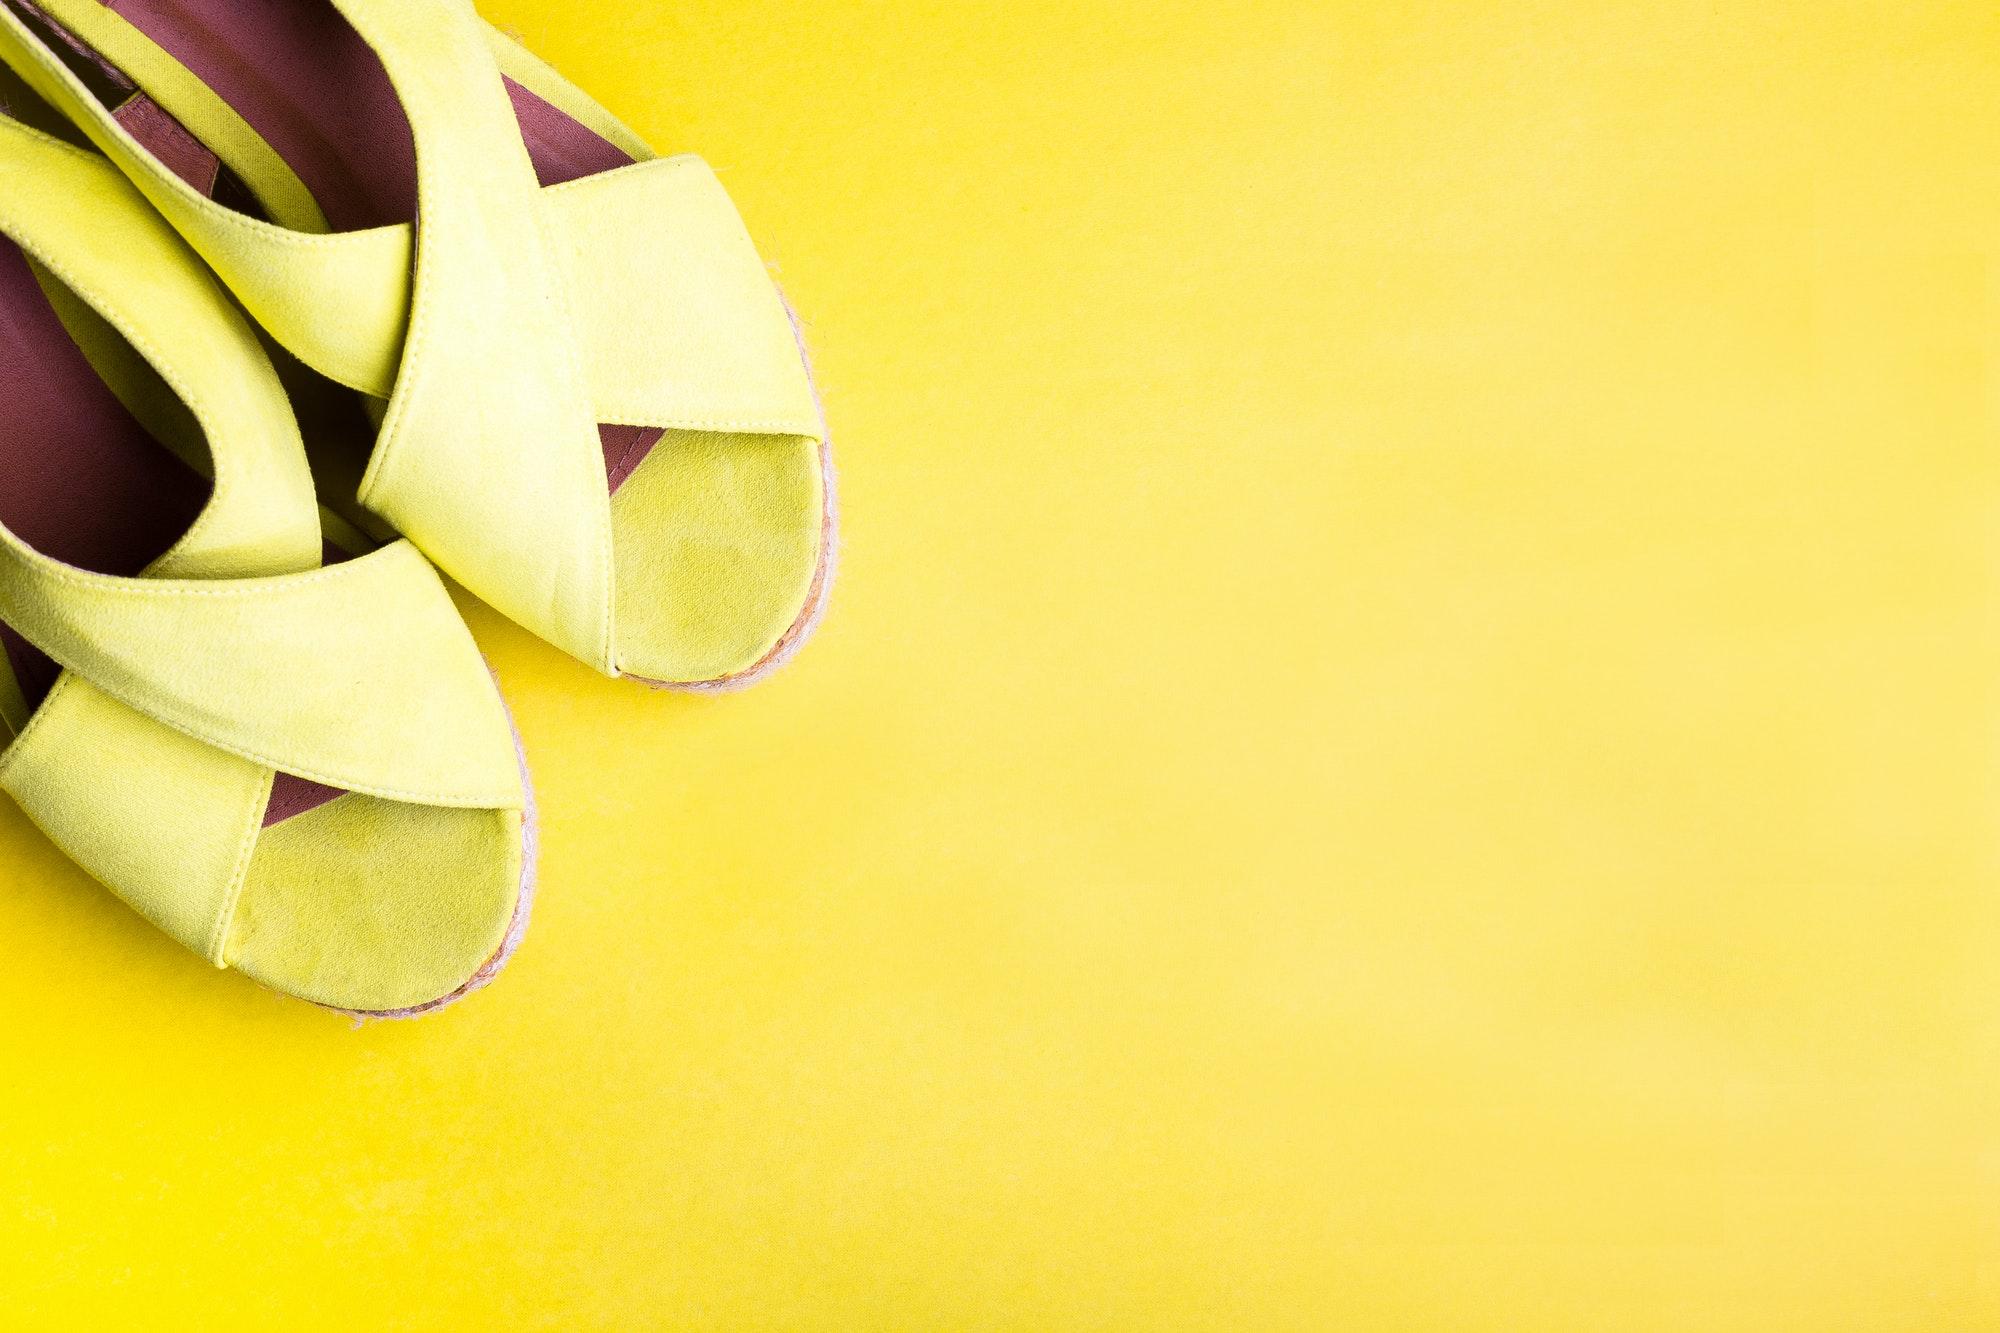 Yellow Platform Sandals on Peper Yellow Background. Flat Lay.